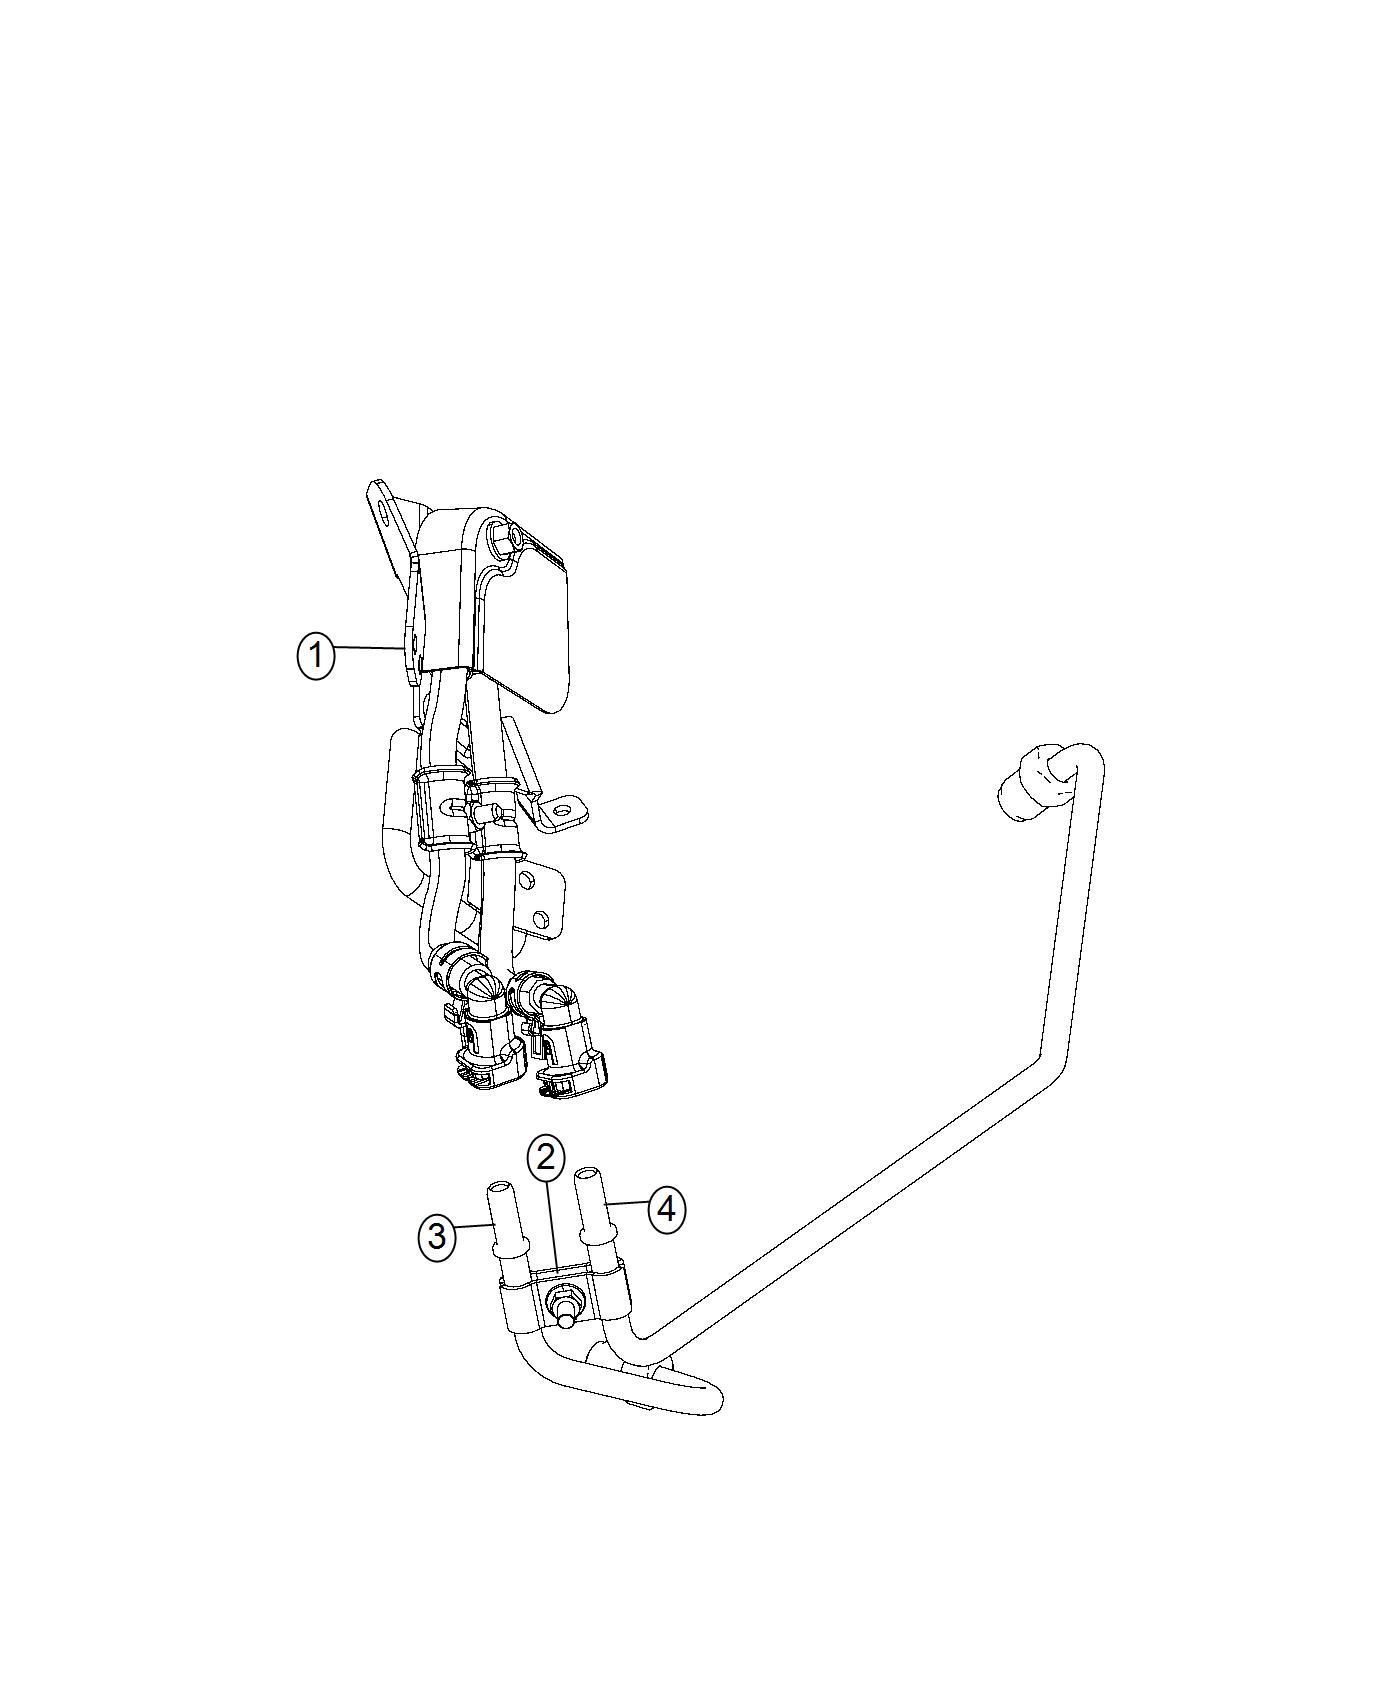 2017 Jeep Grand Cherokee Sensor. Differential pressure